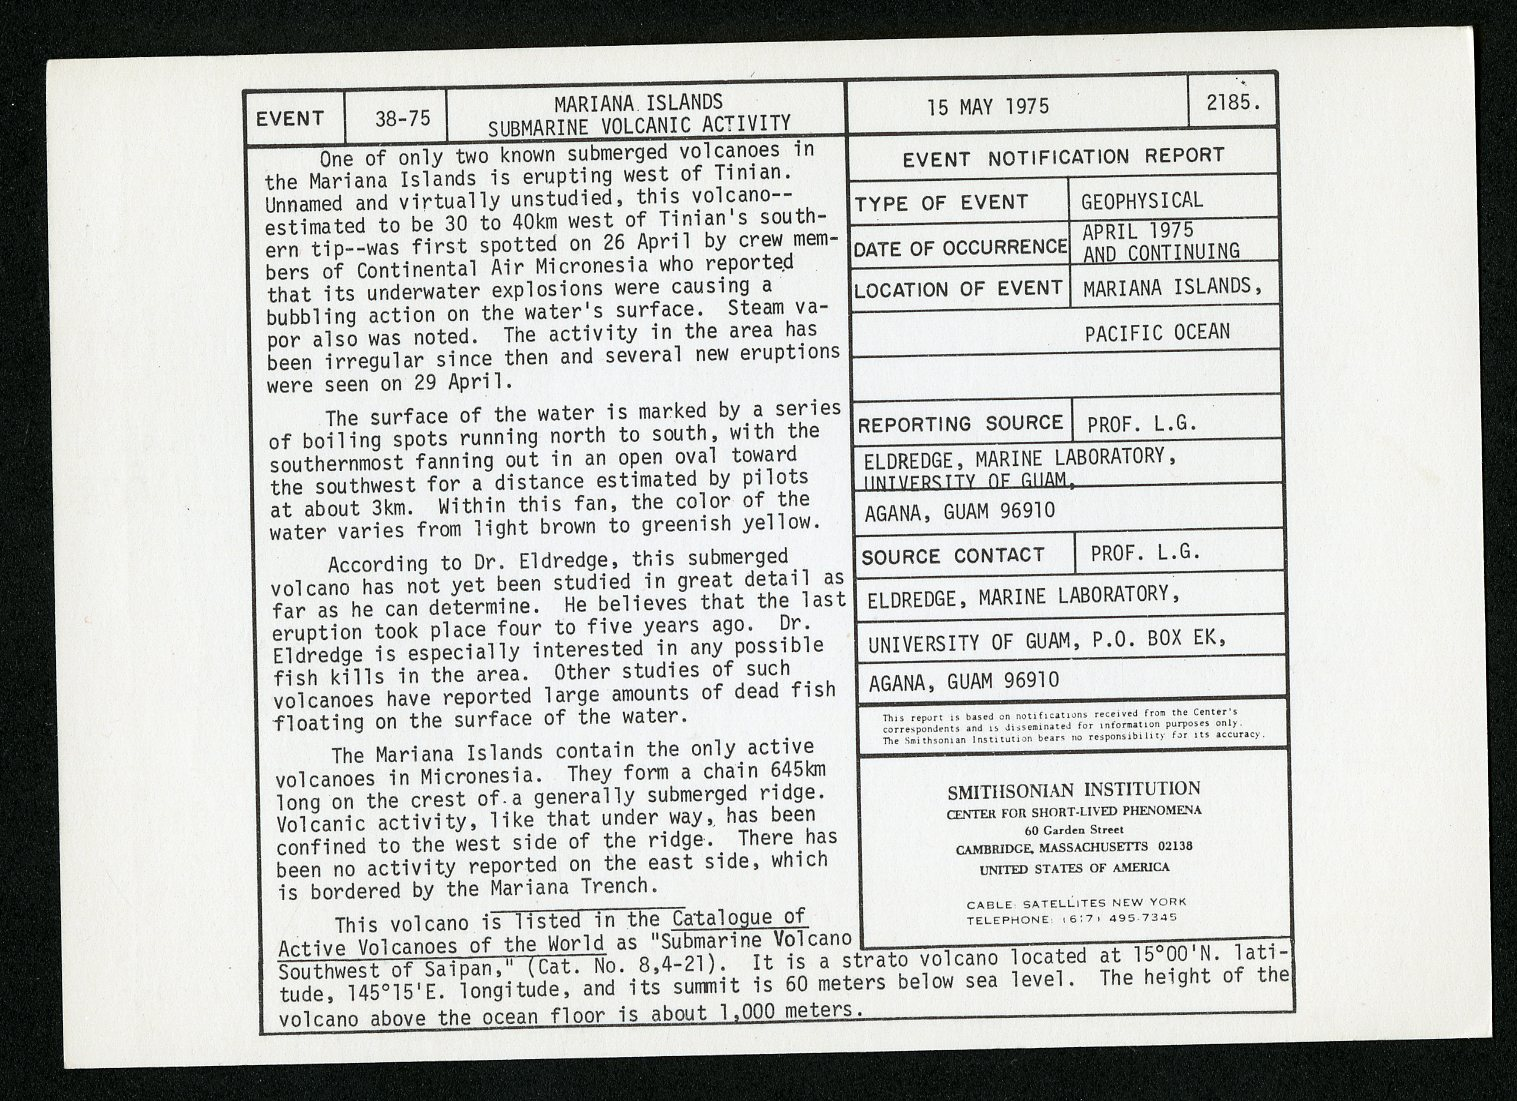 Event card - Mariana Islands Submarine Volcanic Activity, May 15, 1975